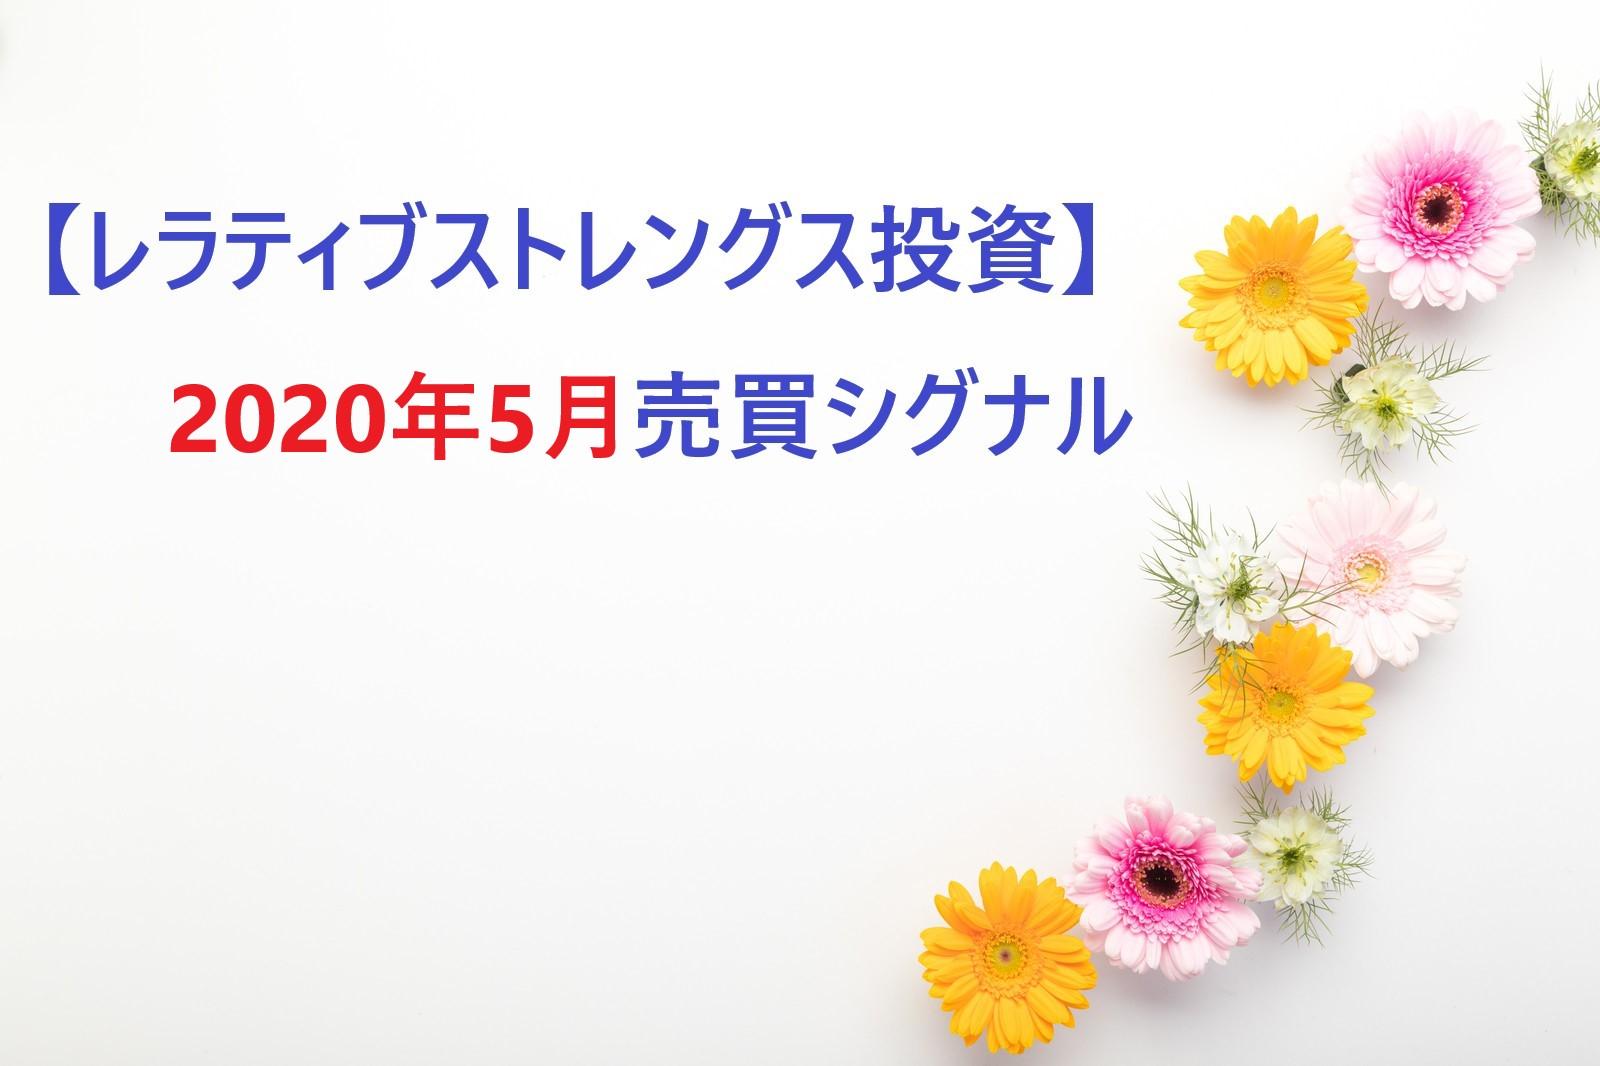 RS投資シグナル-202005